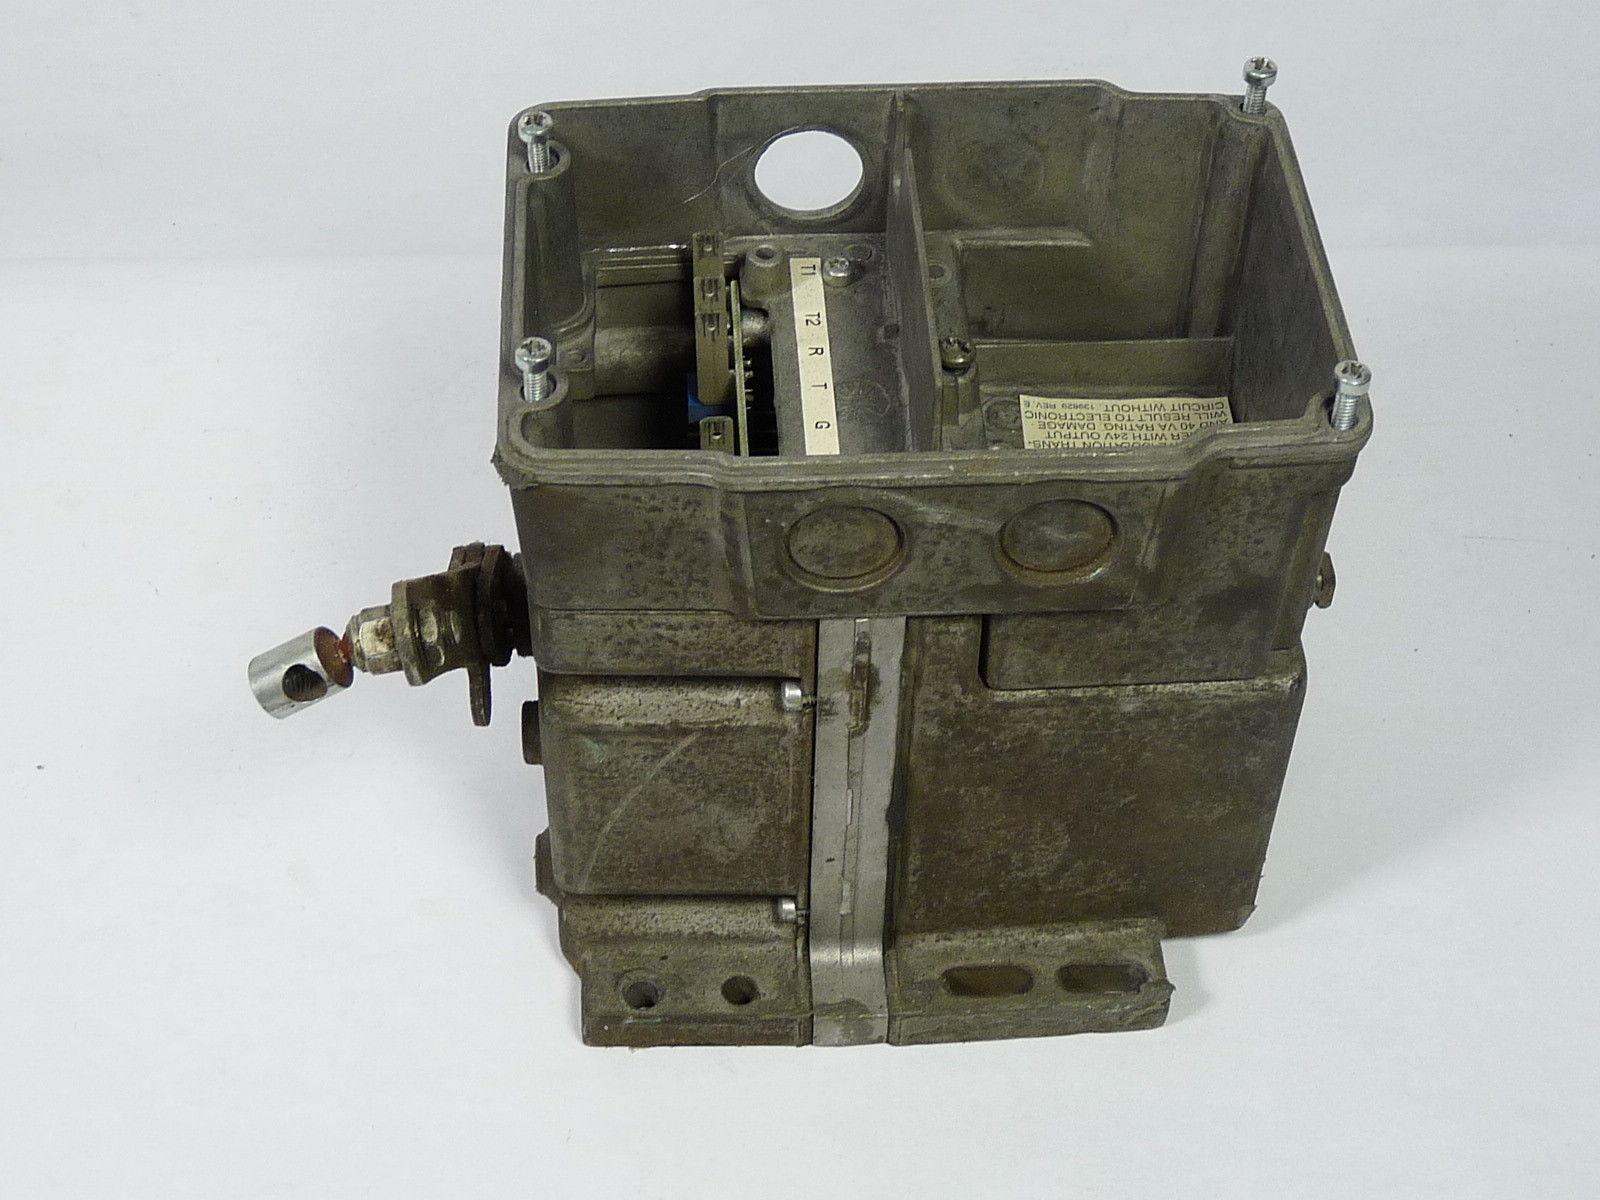 Honeywell M9814d 4009 Modutrol Actuator Motor 24vac Used